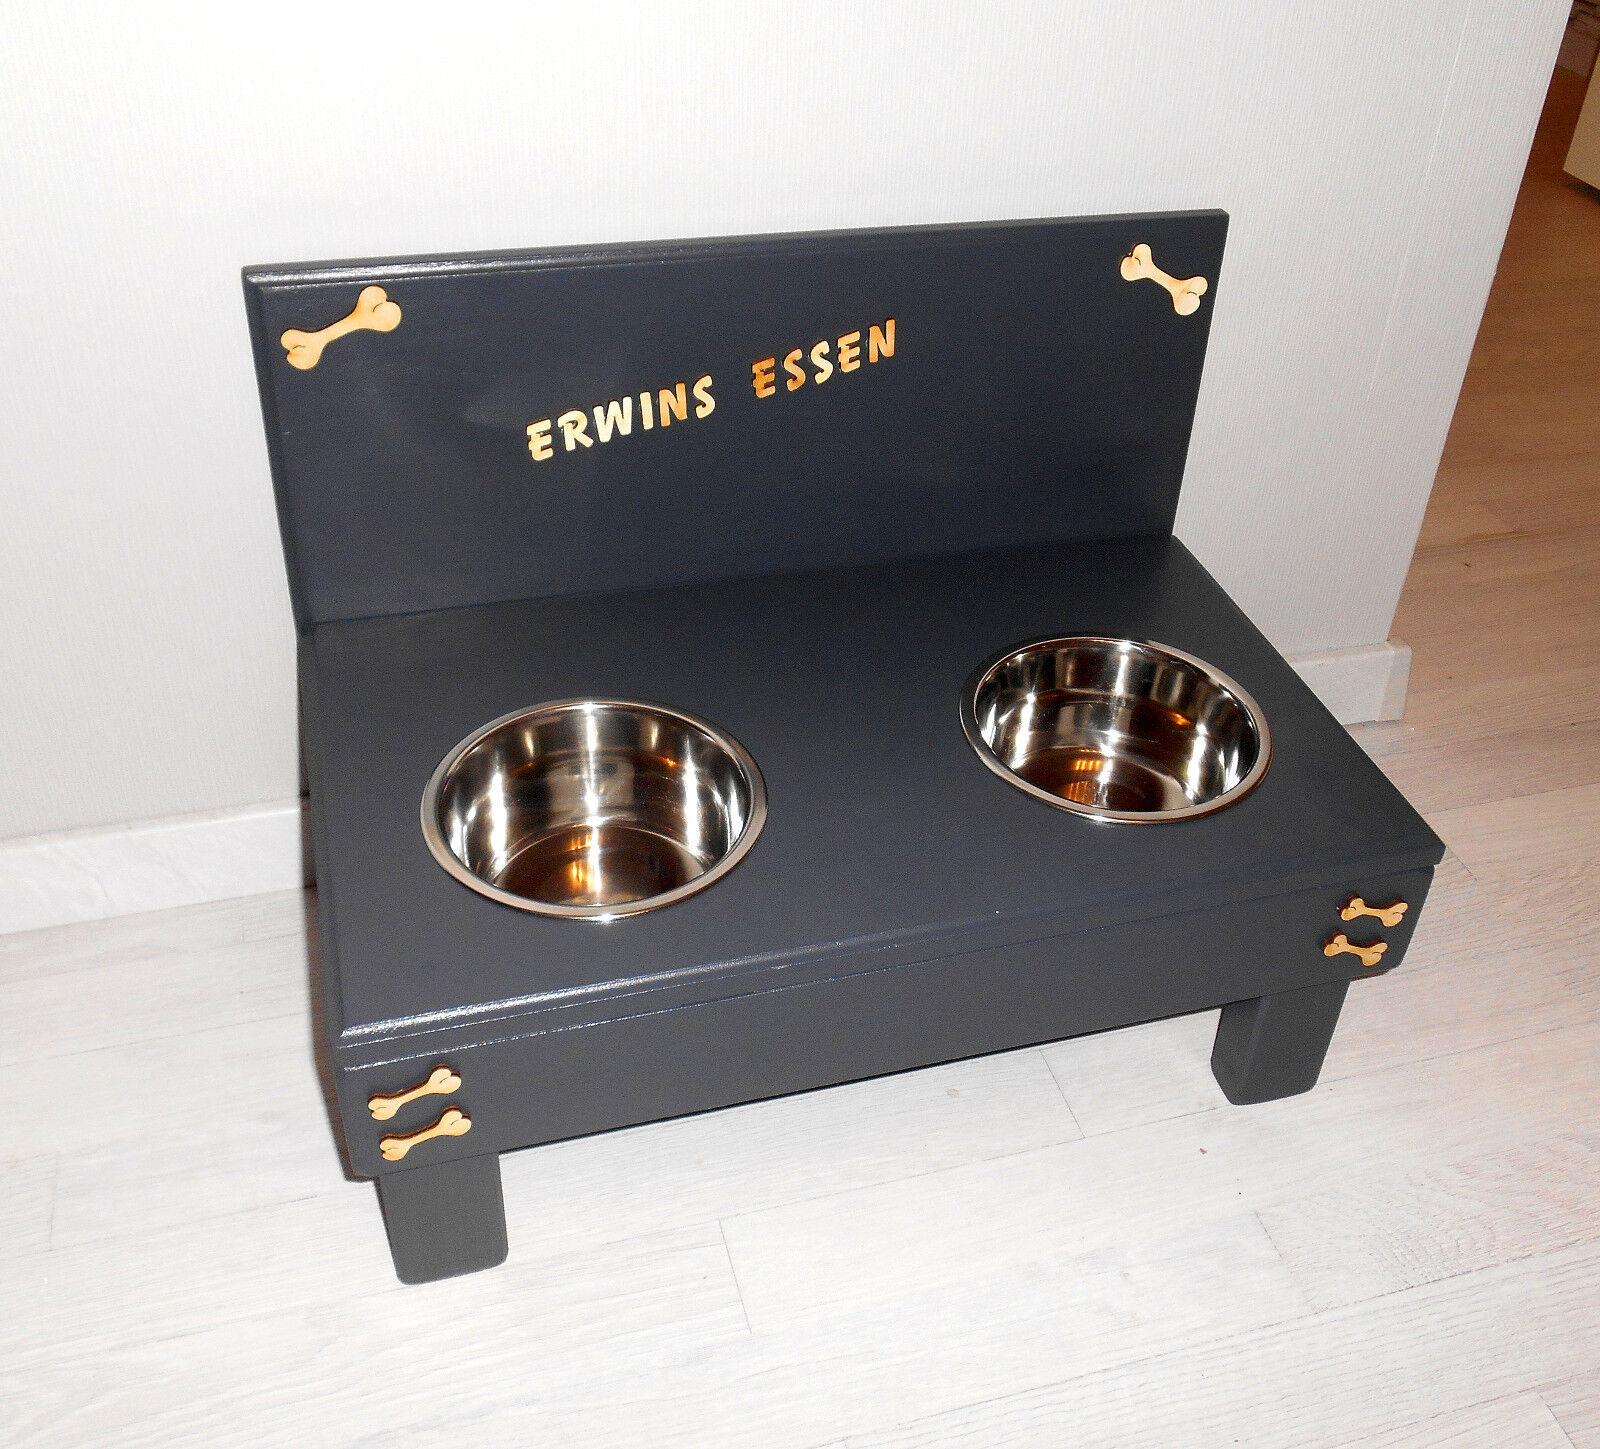 Hundenapf   Hundebar   Hohe 20 cm Futterbar, anthrazit, Napfbar (1036a)  | Zu verkaufen